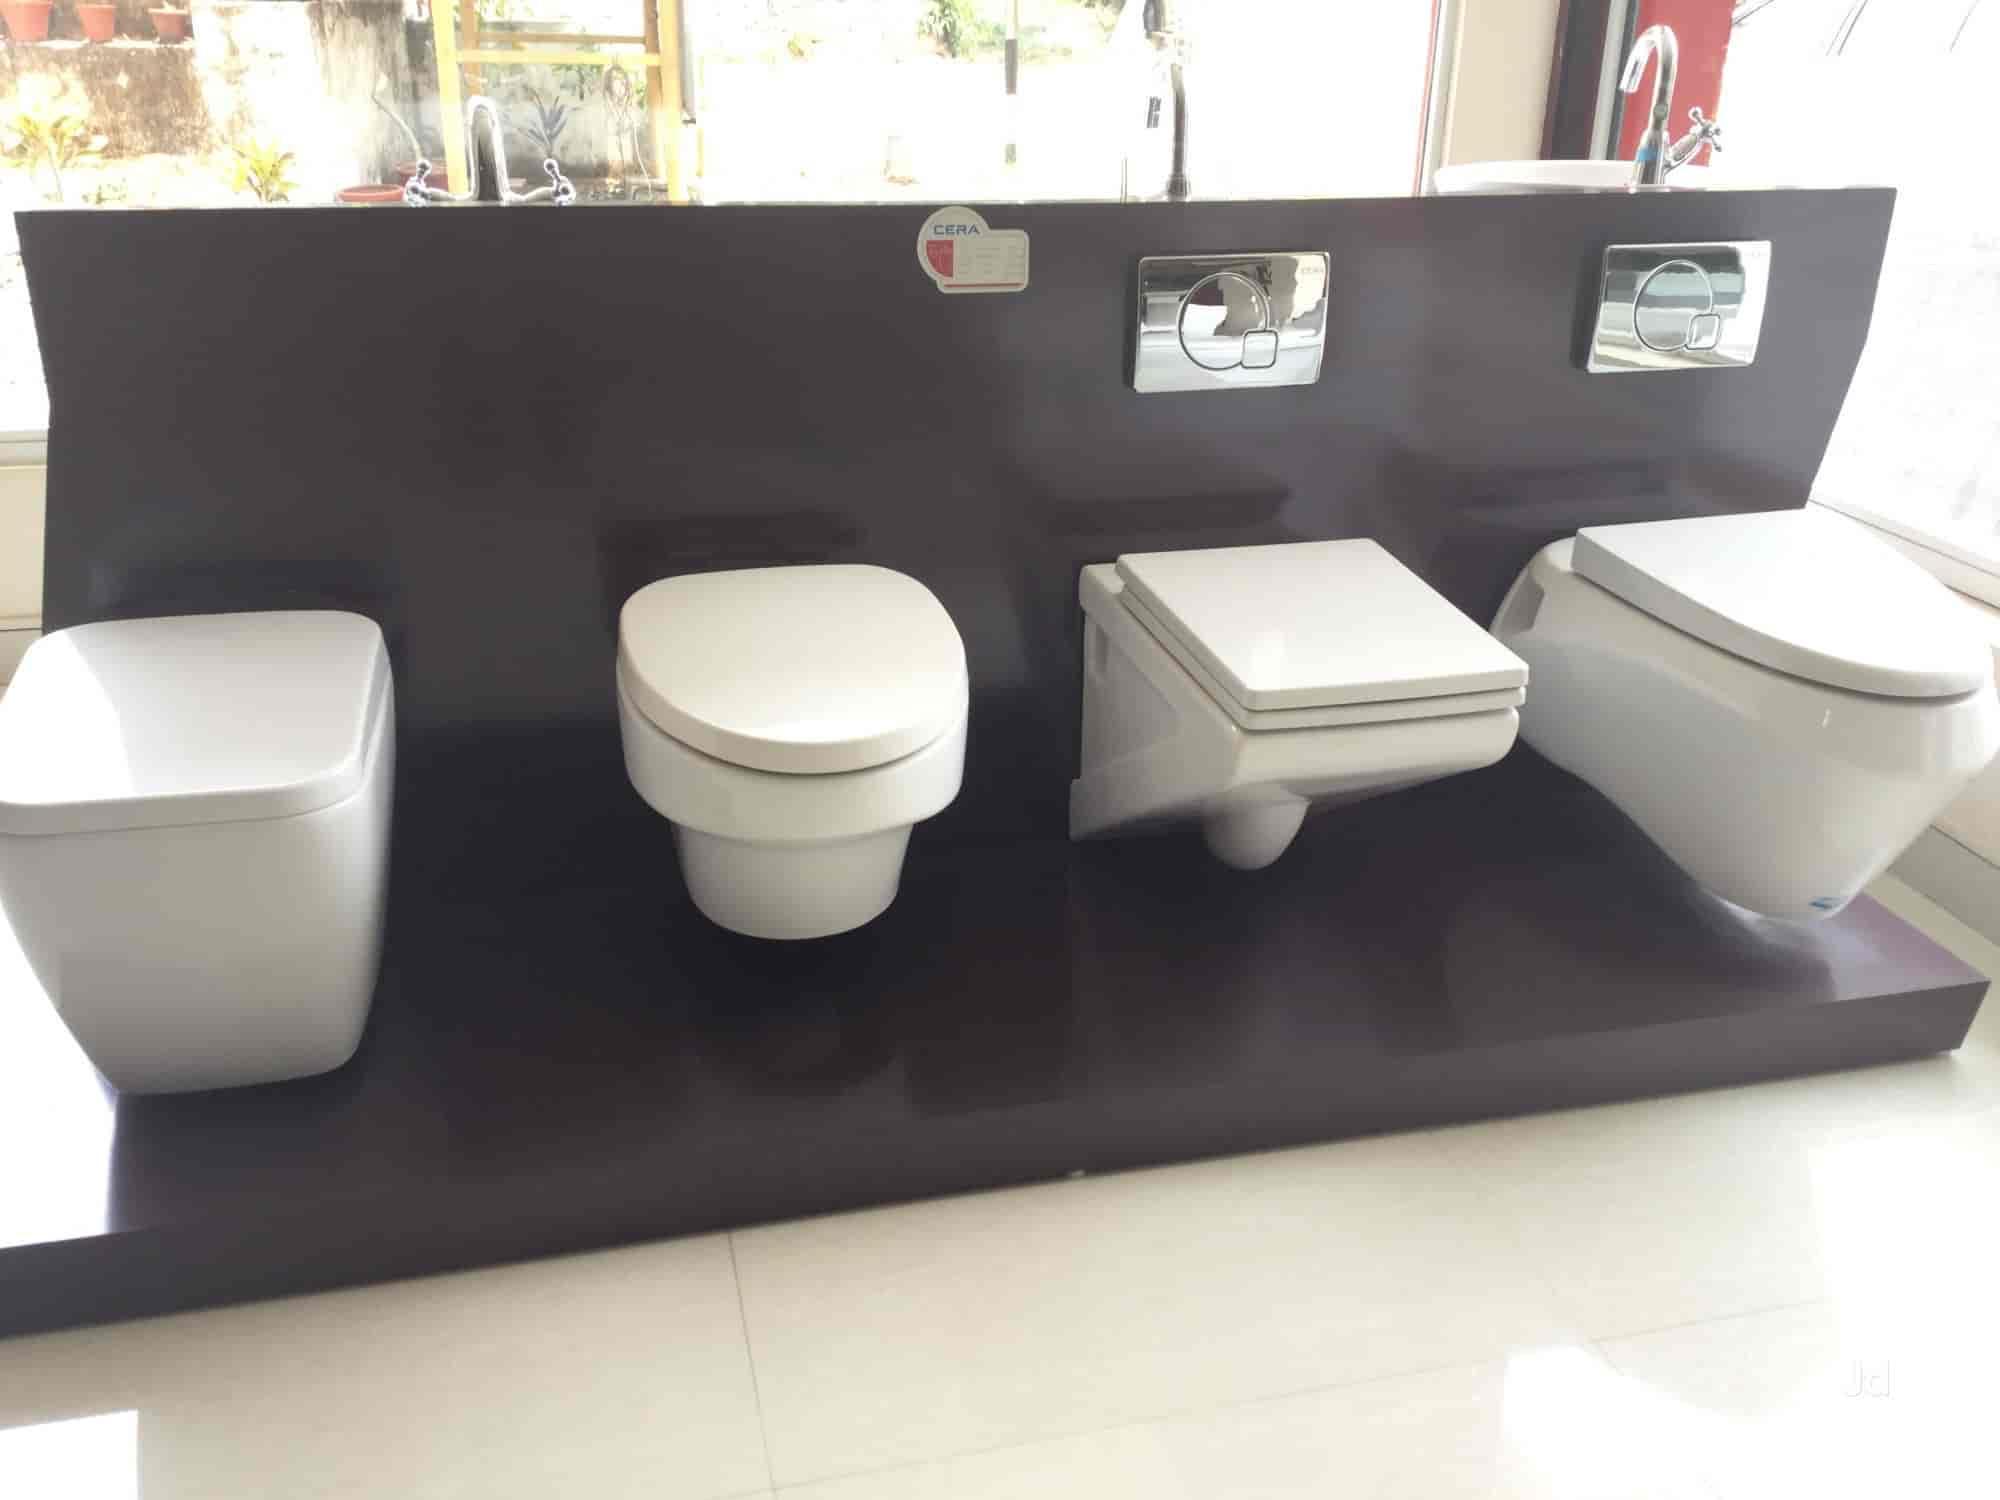 21st century tiles sanitary photos kothamangalam ernakulam 21st century tiles sanitary photos kothamangalam ernakulam tile dealers shiifo